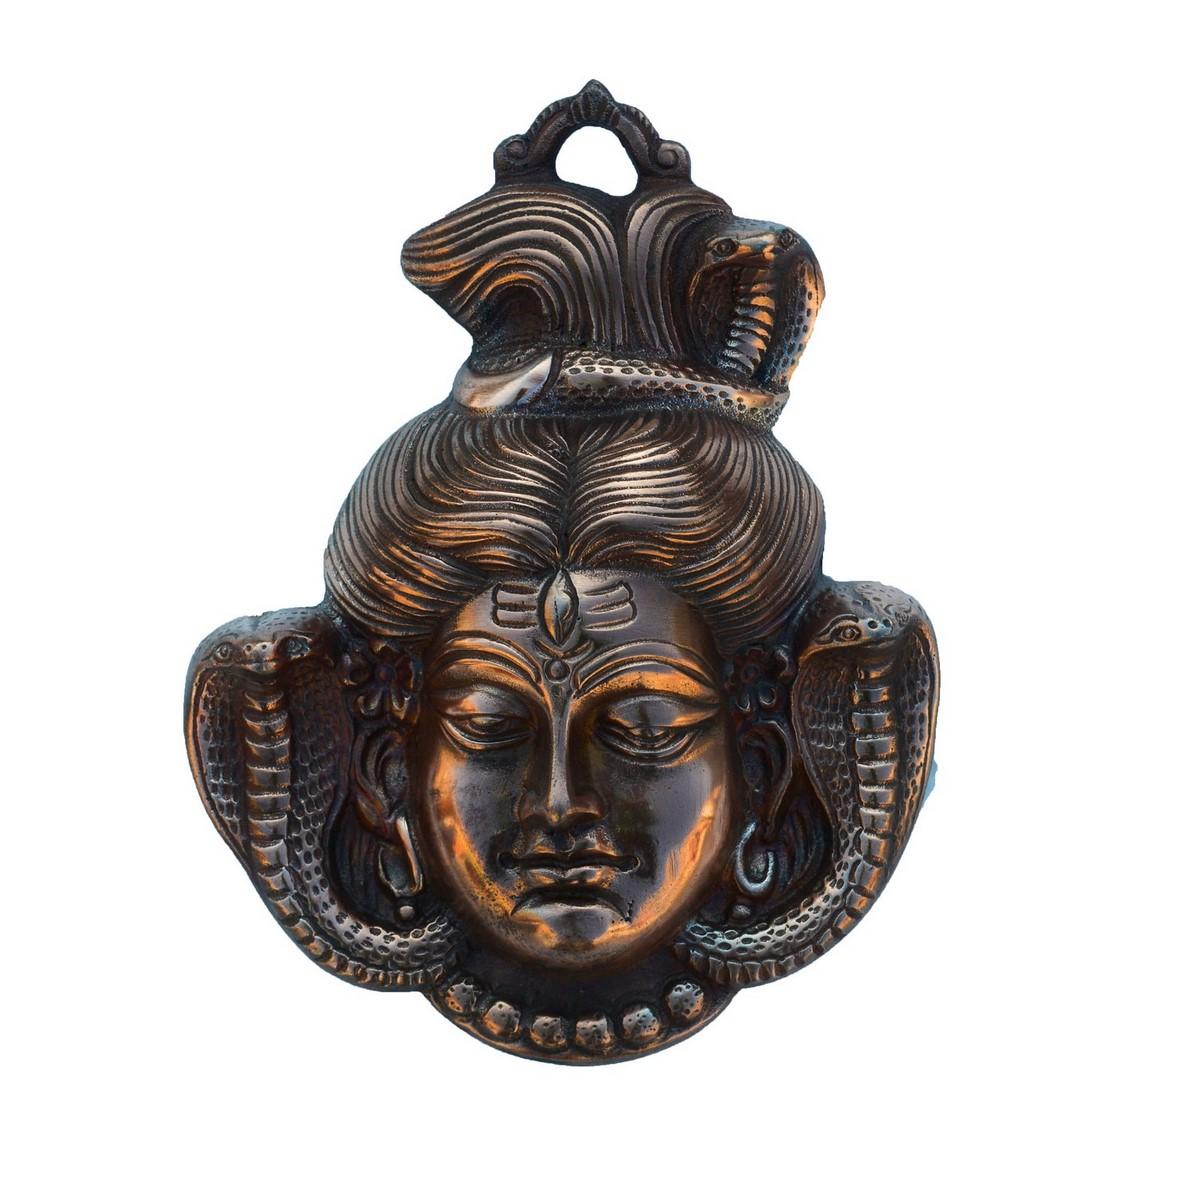 Lord Shiva Metal Wall hanging Indian Home Decor